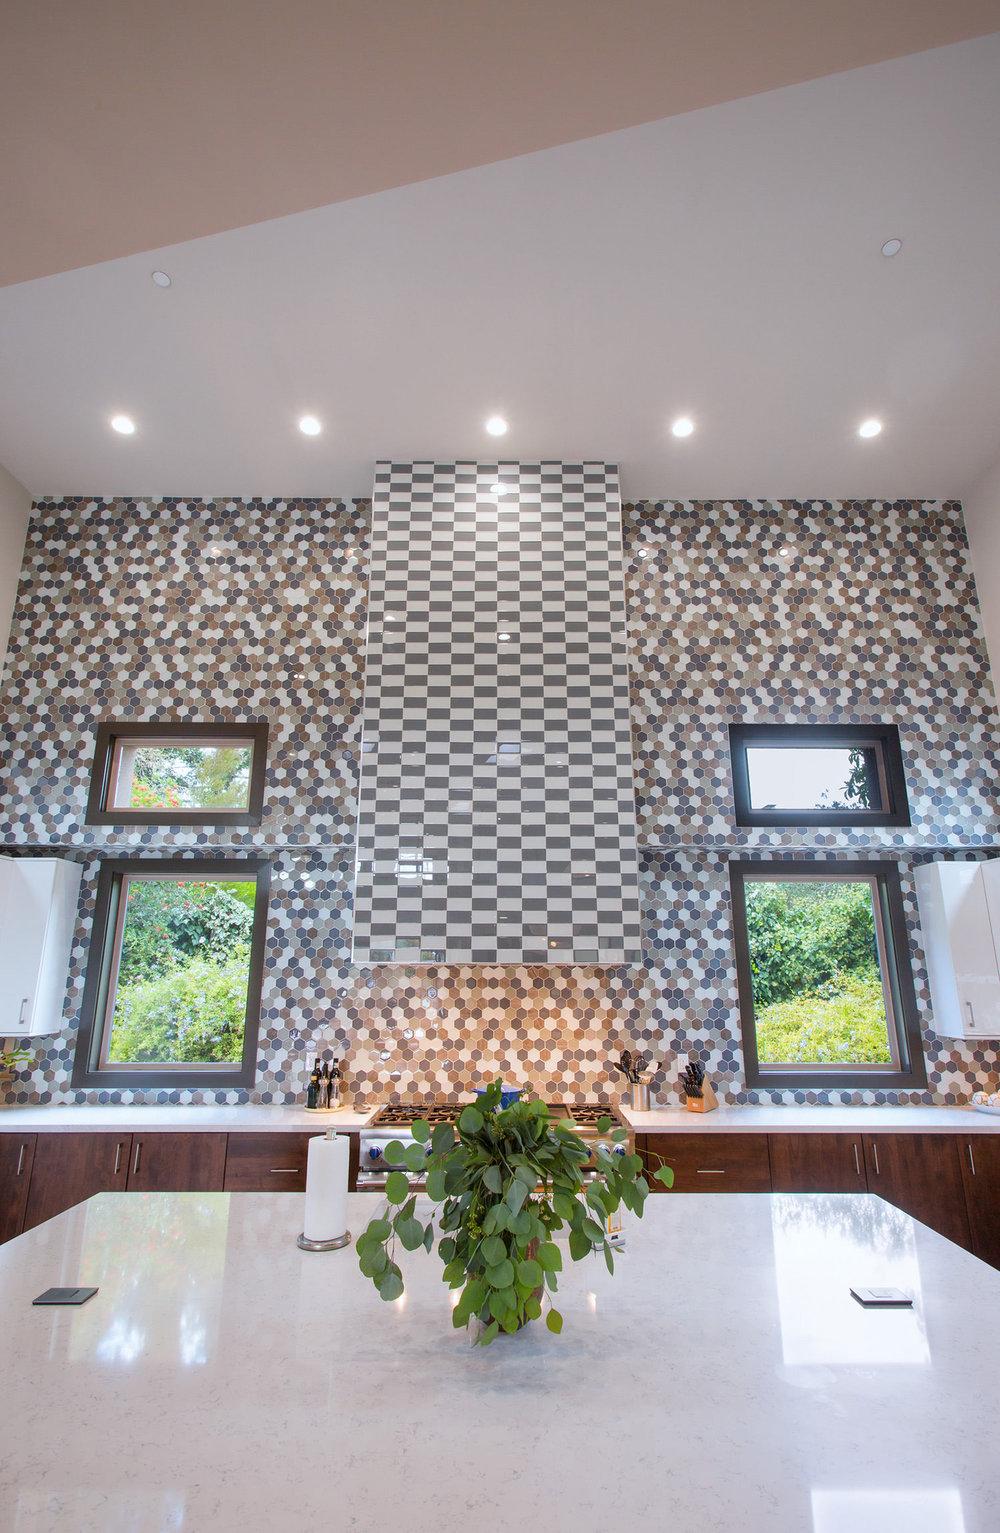 kitchen-interior-design-los-altos-california-ktj-design-co-7.jpg